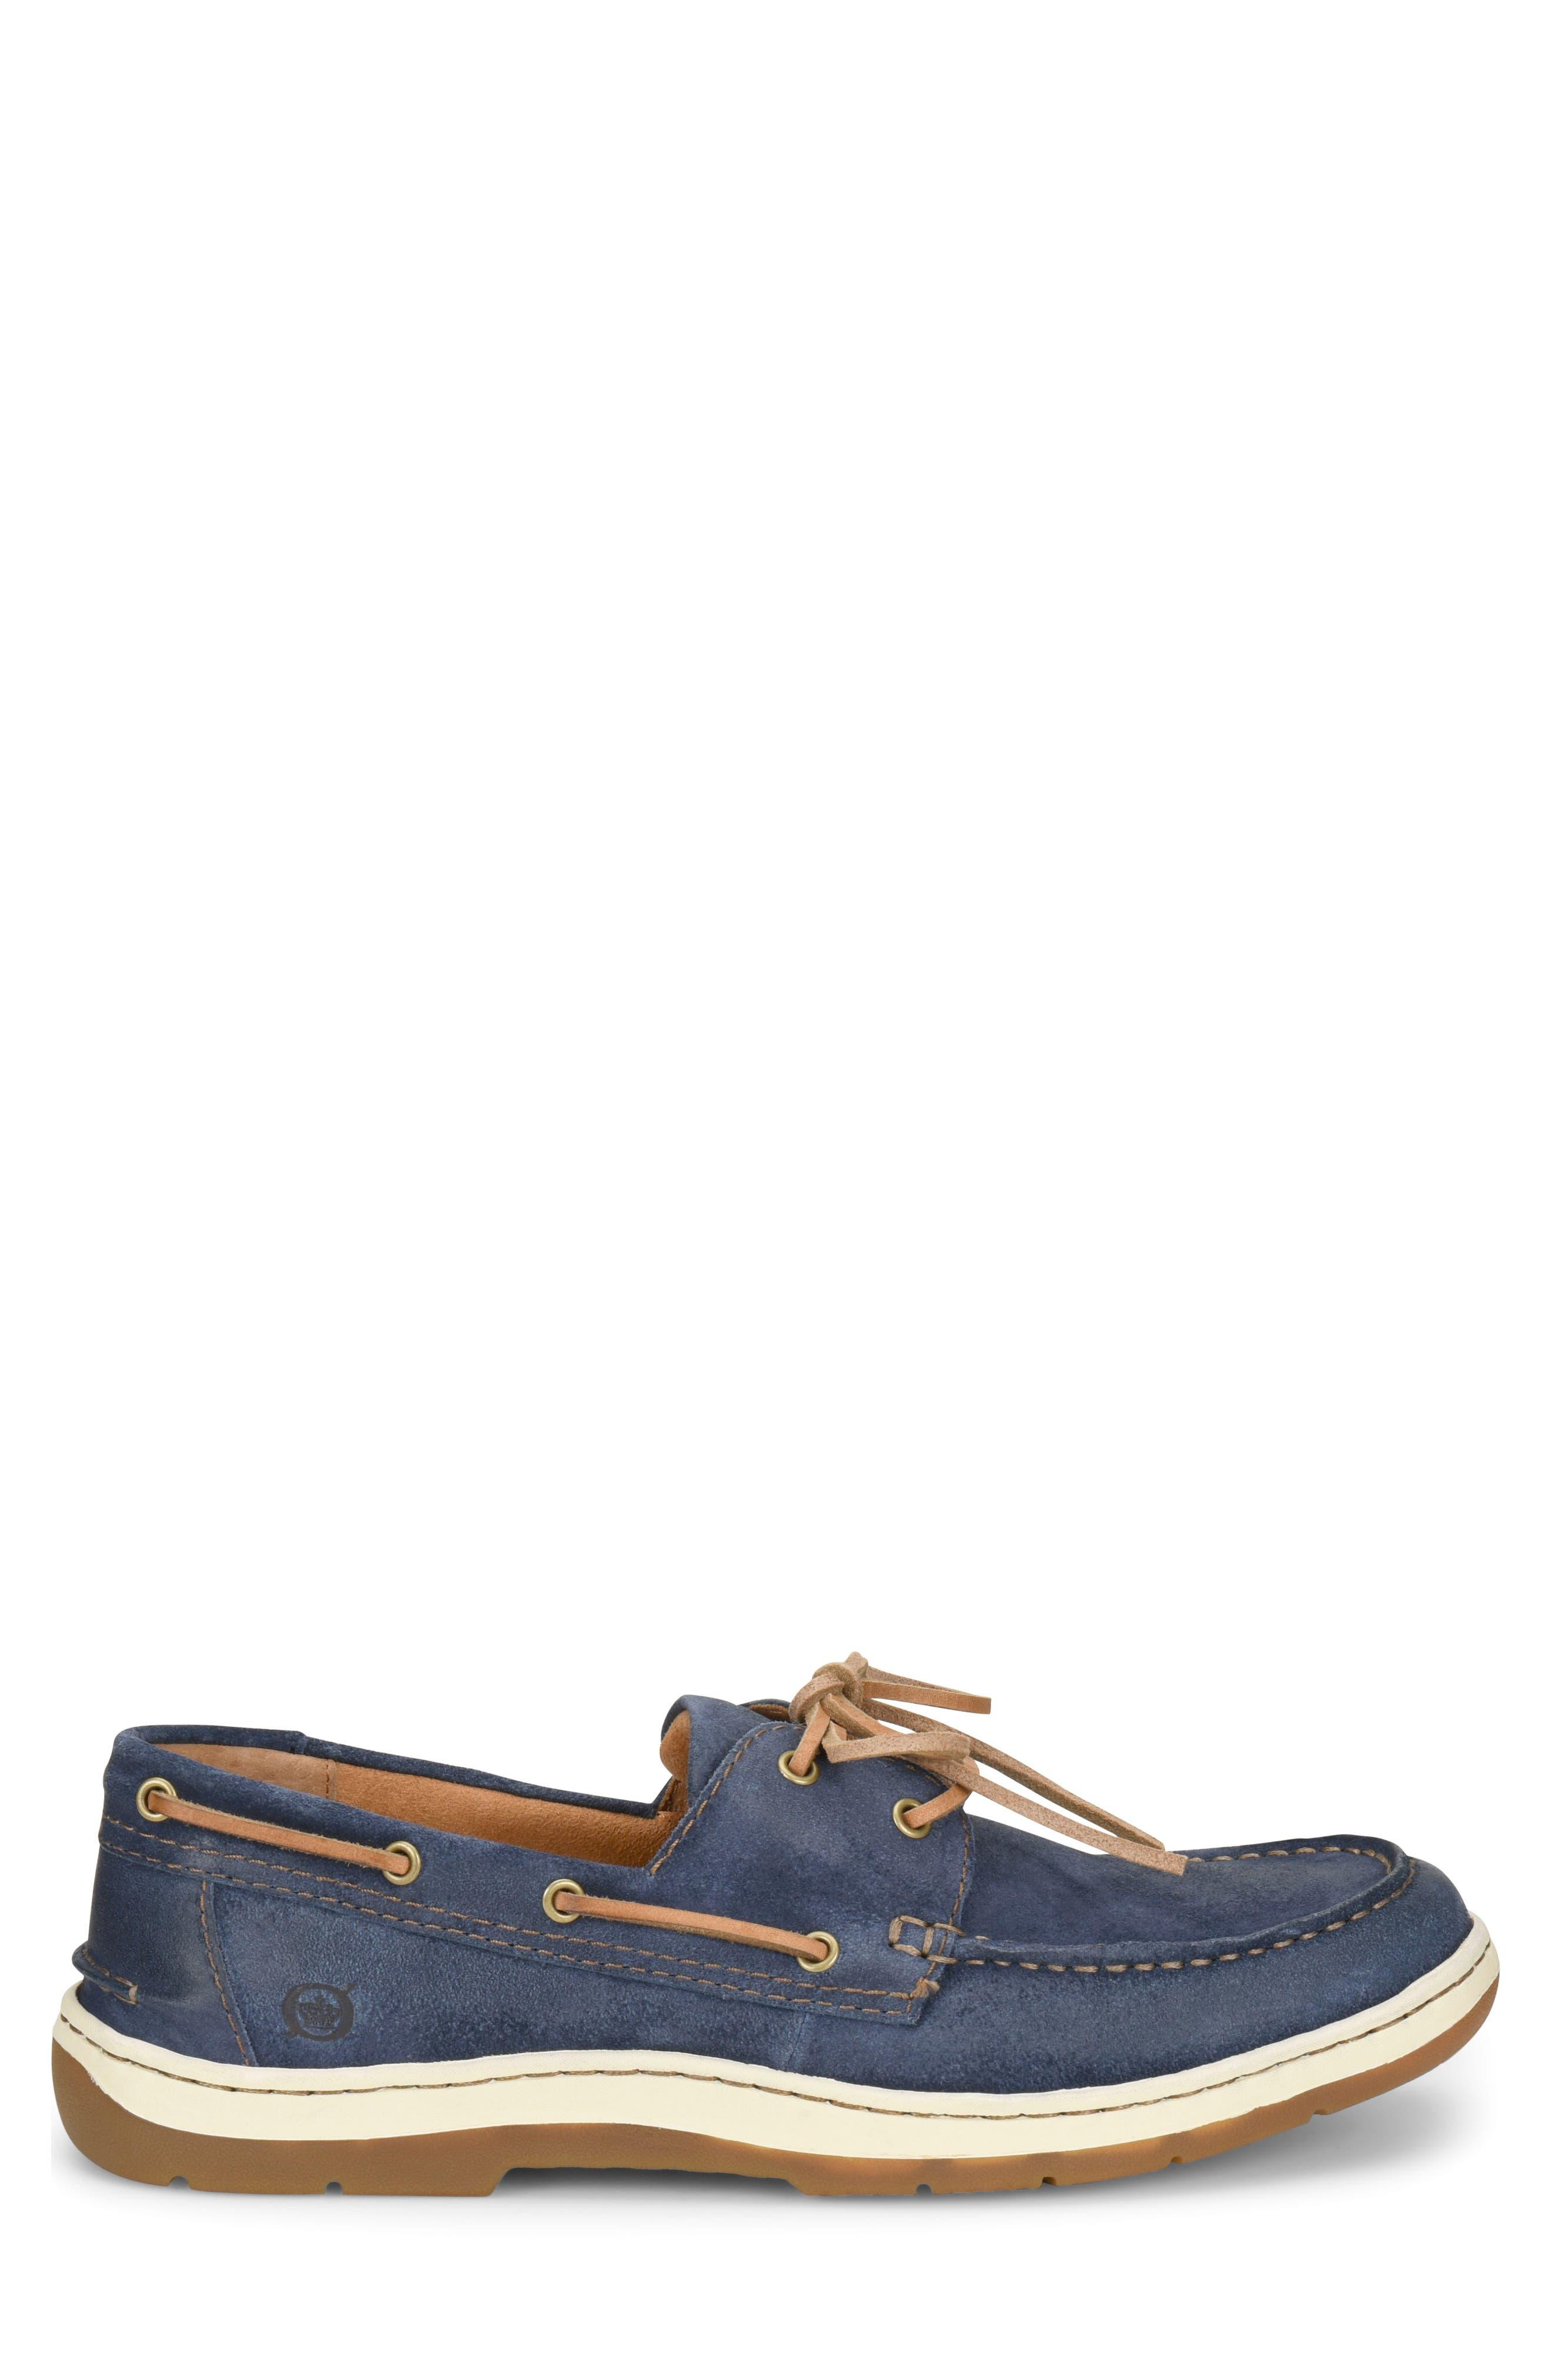 Ocean Boat Shoe,                             Alternate thumbnail 3, color,                             Dark Blue Leather